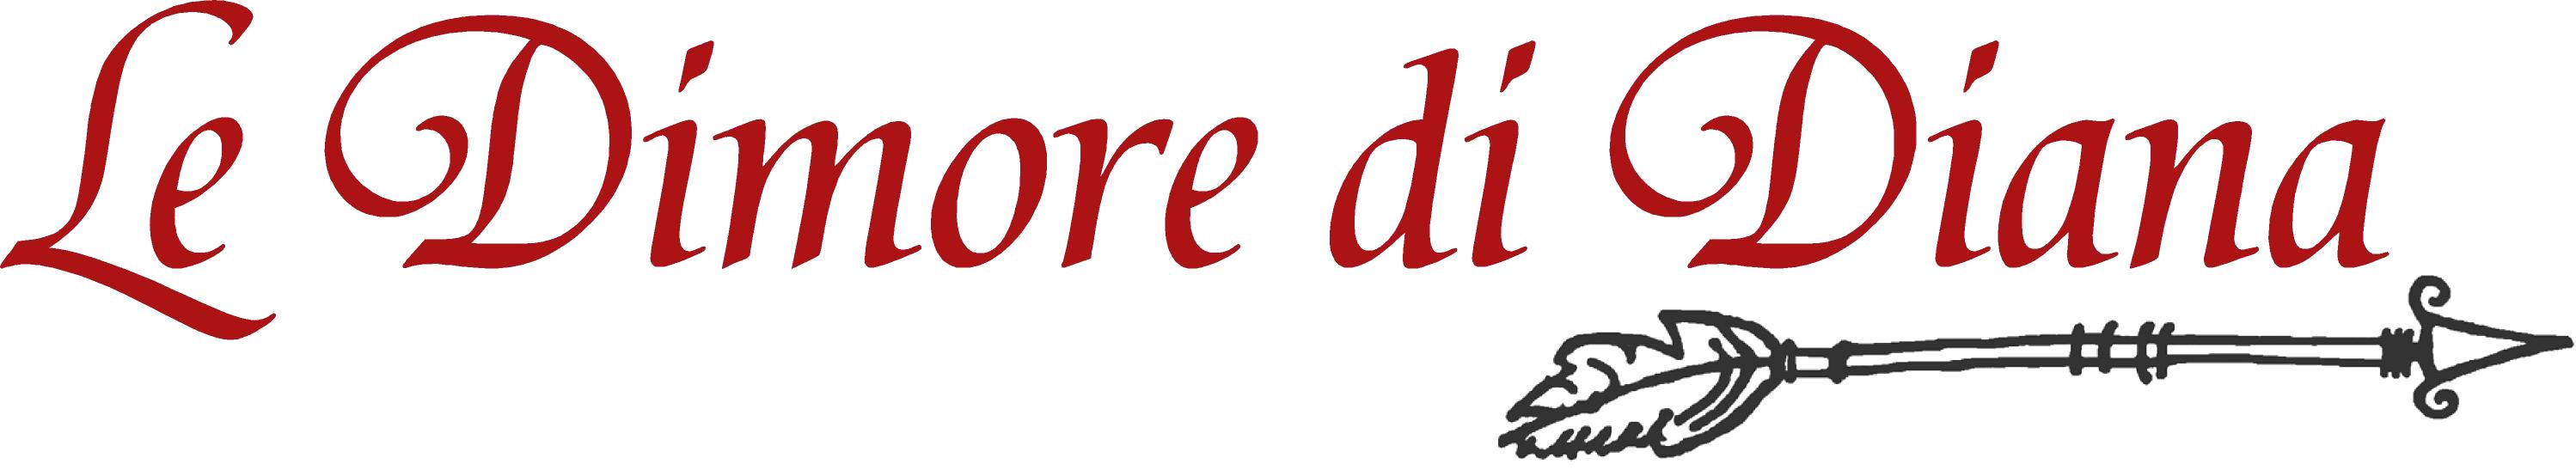 Le Dimore di Diana - Logo